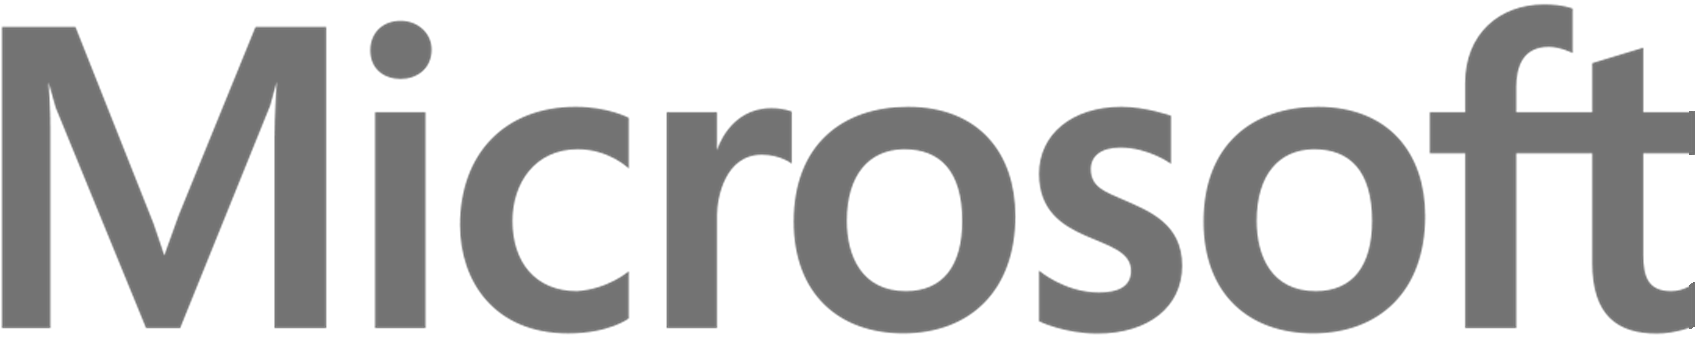 Microsoft_logo_alt